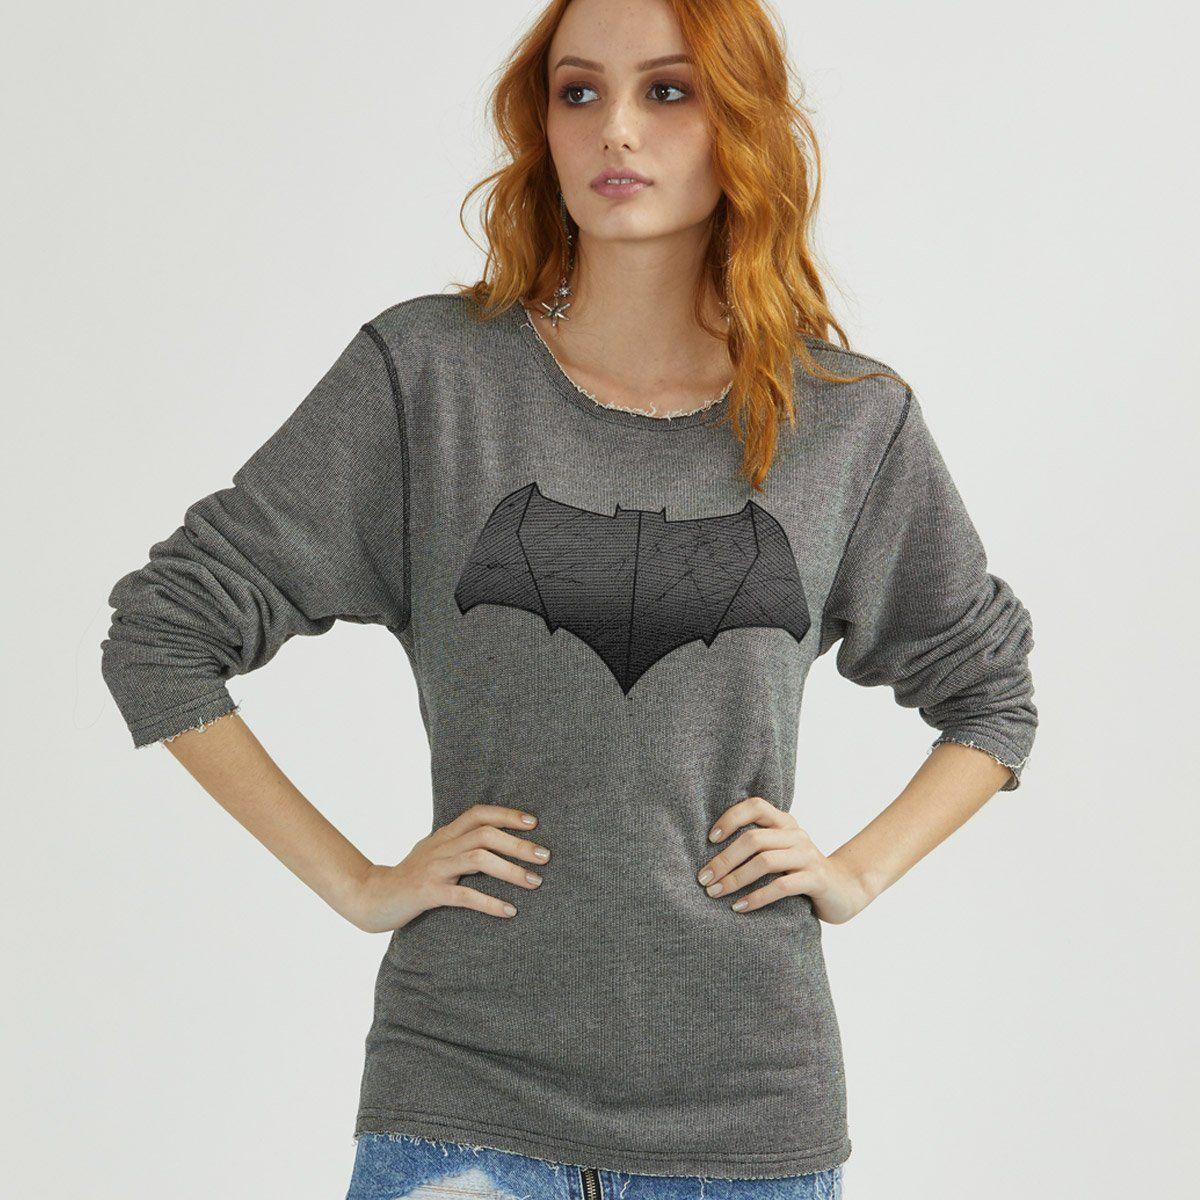 Moletinho Texturizado Feminino Batman Shield